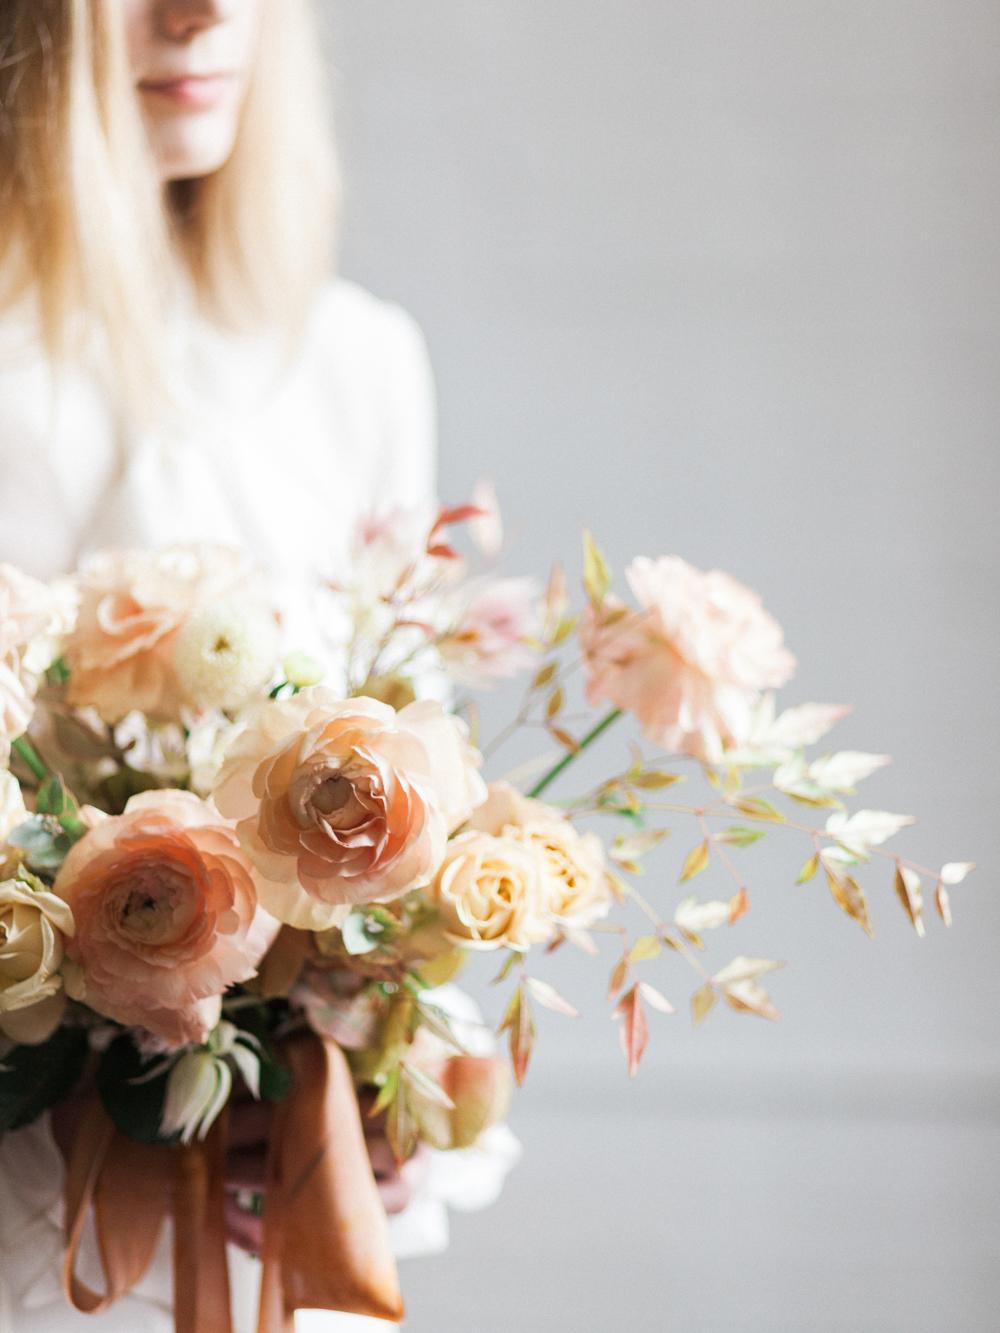 Christine Gosch - The Petaler - Houston fine art photographer - houston wedding florist-21.jpg